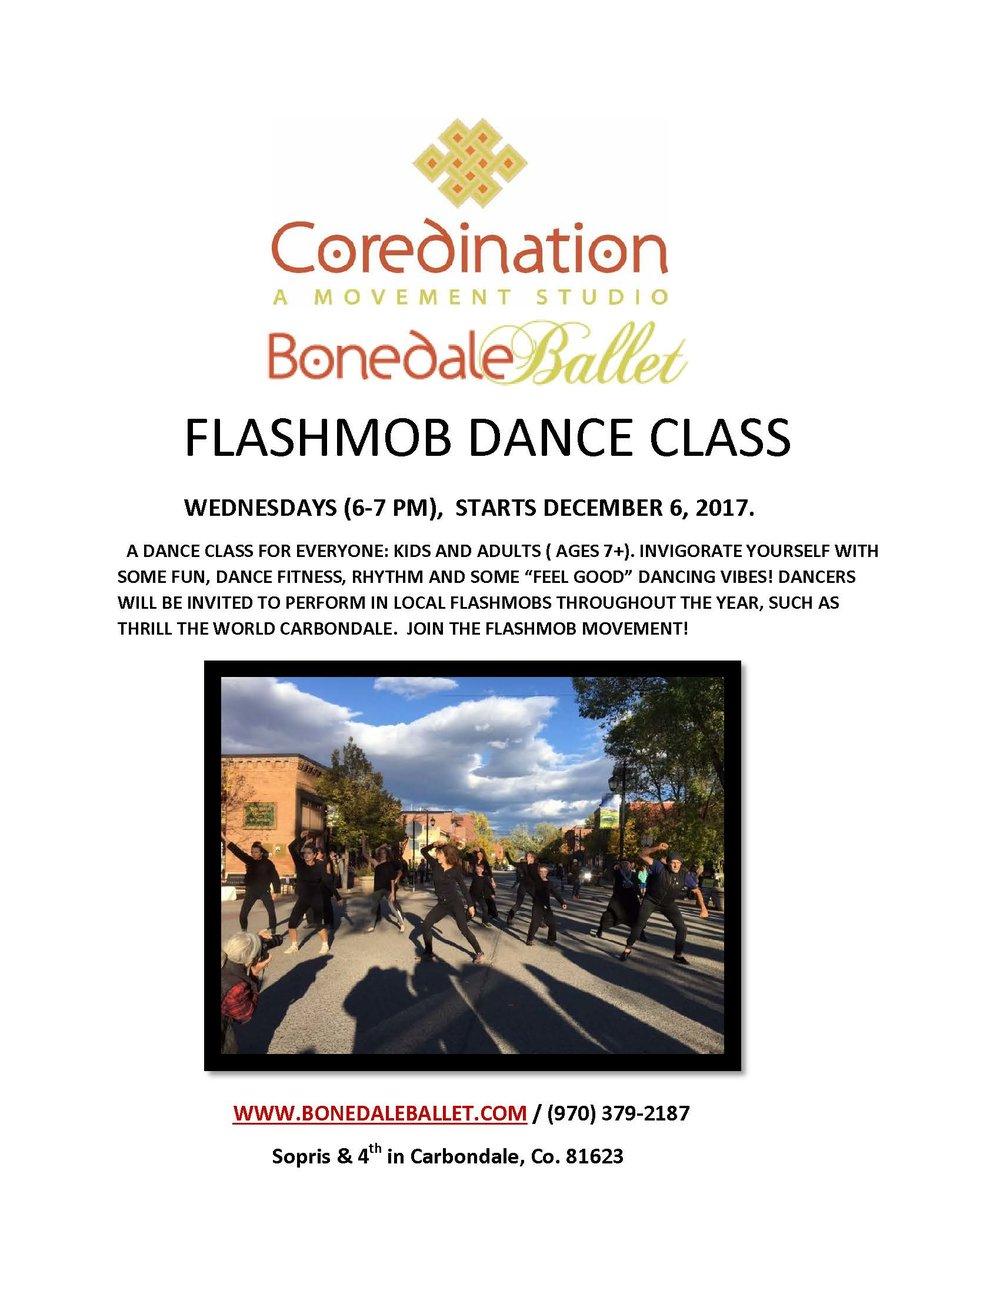 New flashmob dance class 2017-2018 (1)_Page_1 (1).jpg